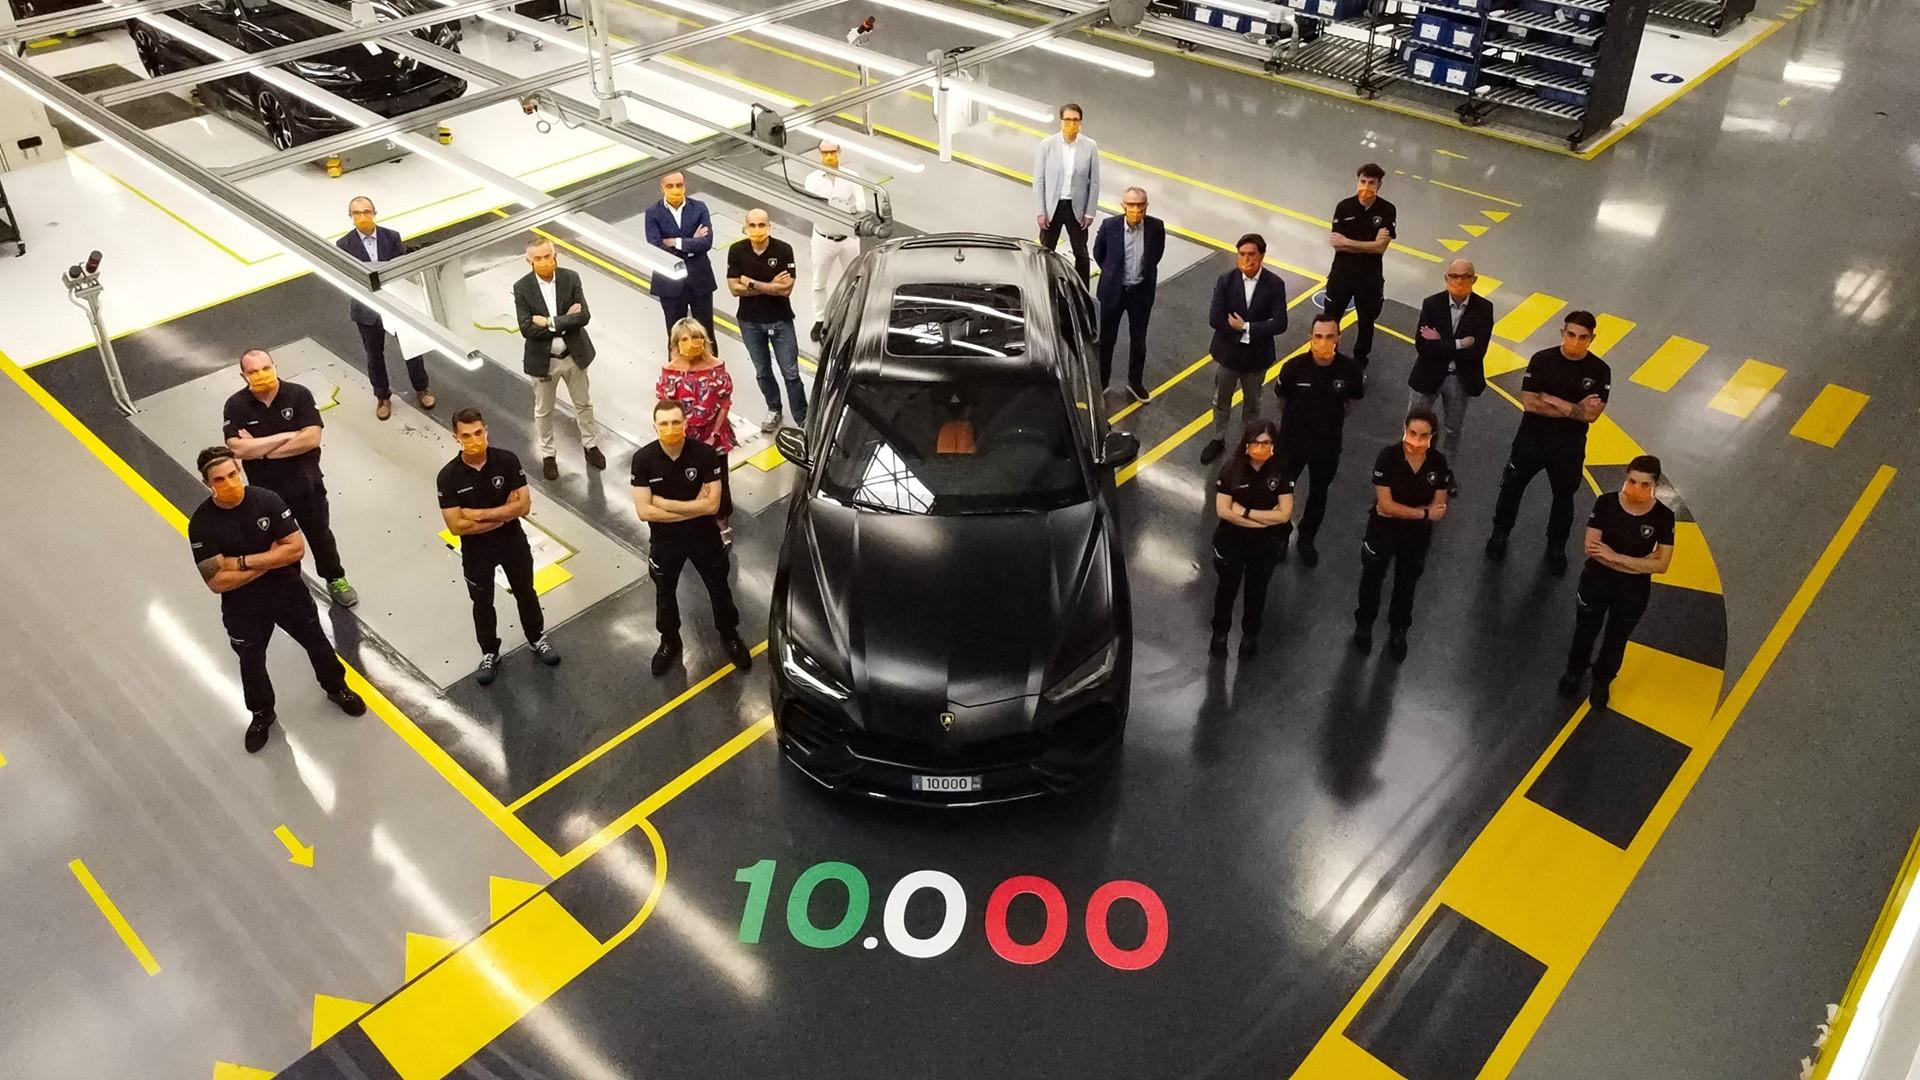 New production record: Automobili Lamborghini celebrates the 10,000th Urus - Image 4